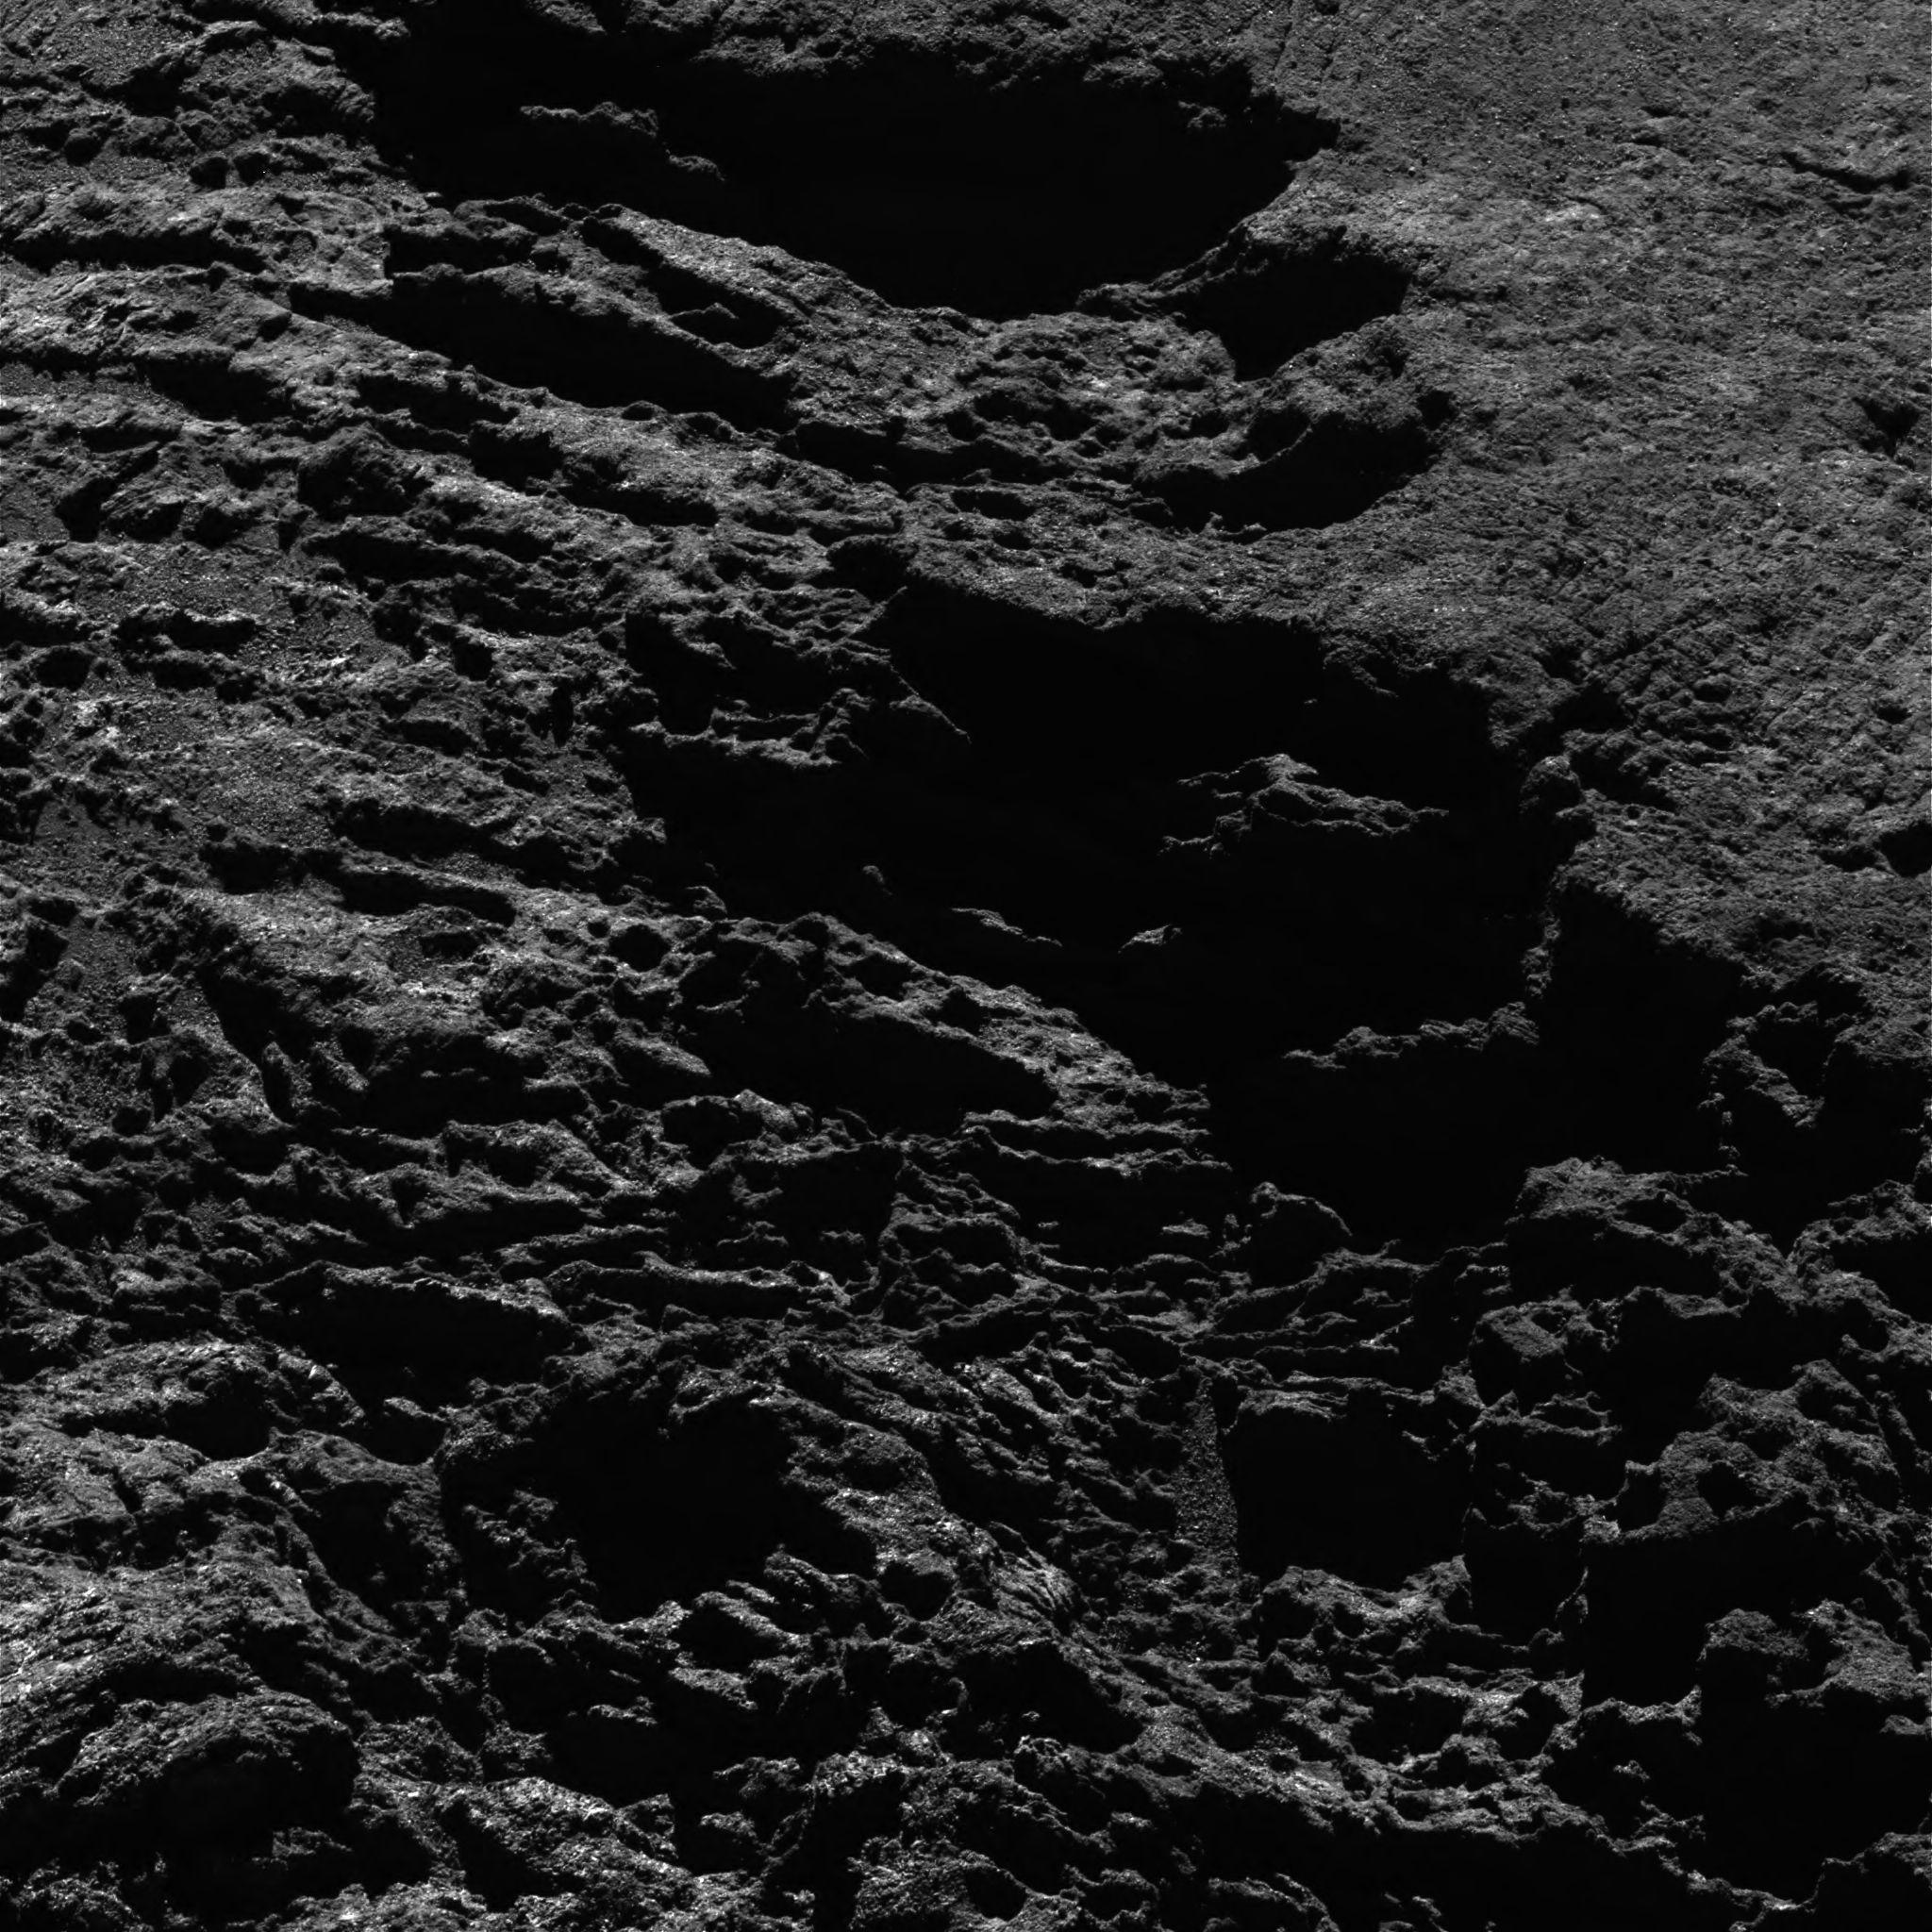 1567215335298-Rosetta_OSIRIS_NAC_comet_67P_20160824T111734.jpg